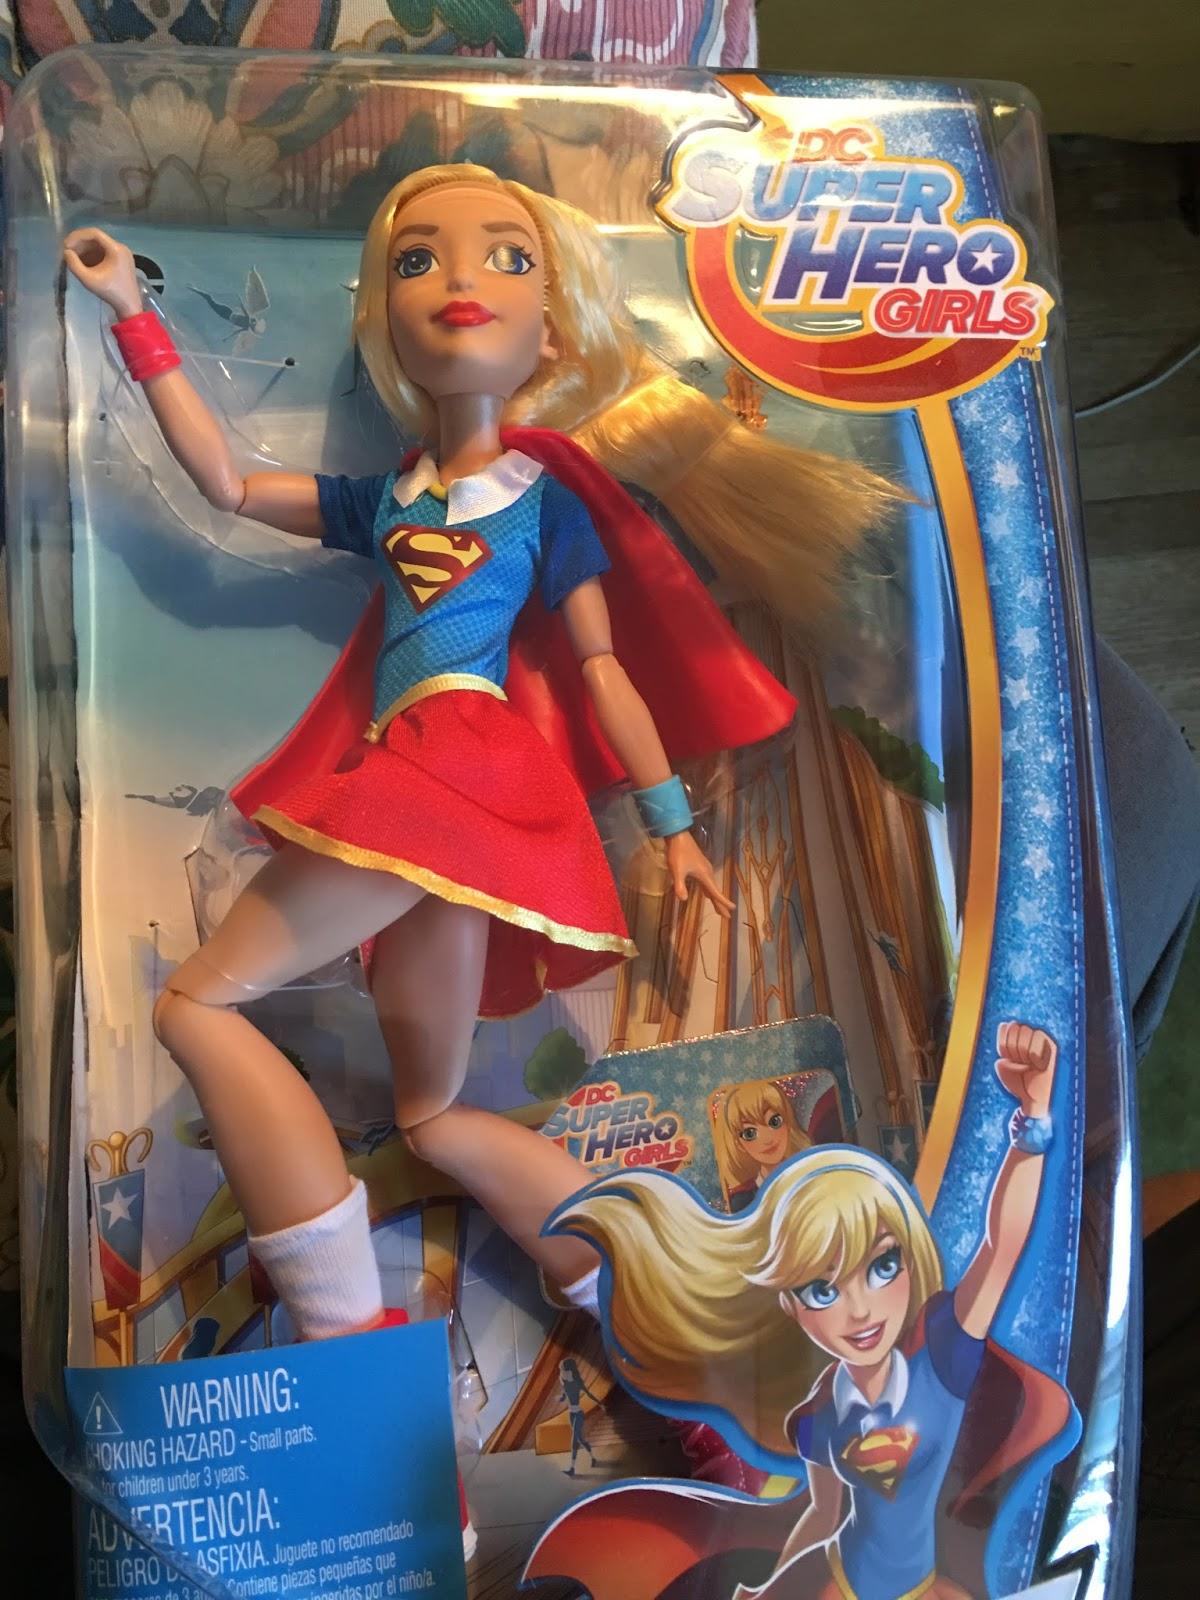 Supergirl sex doll